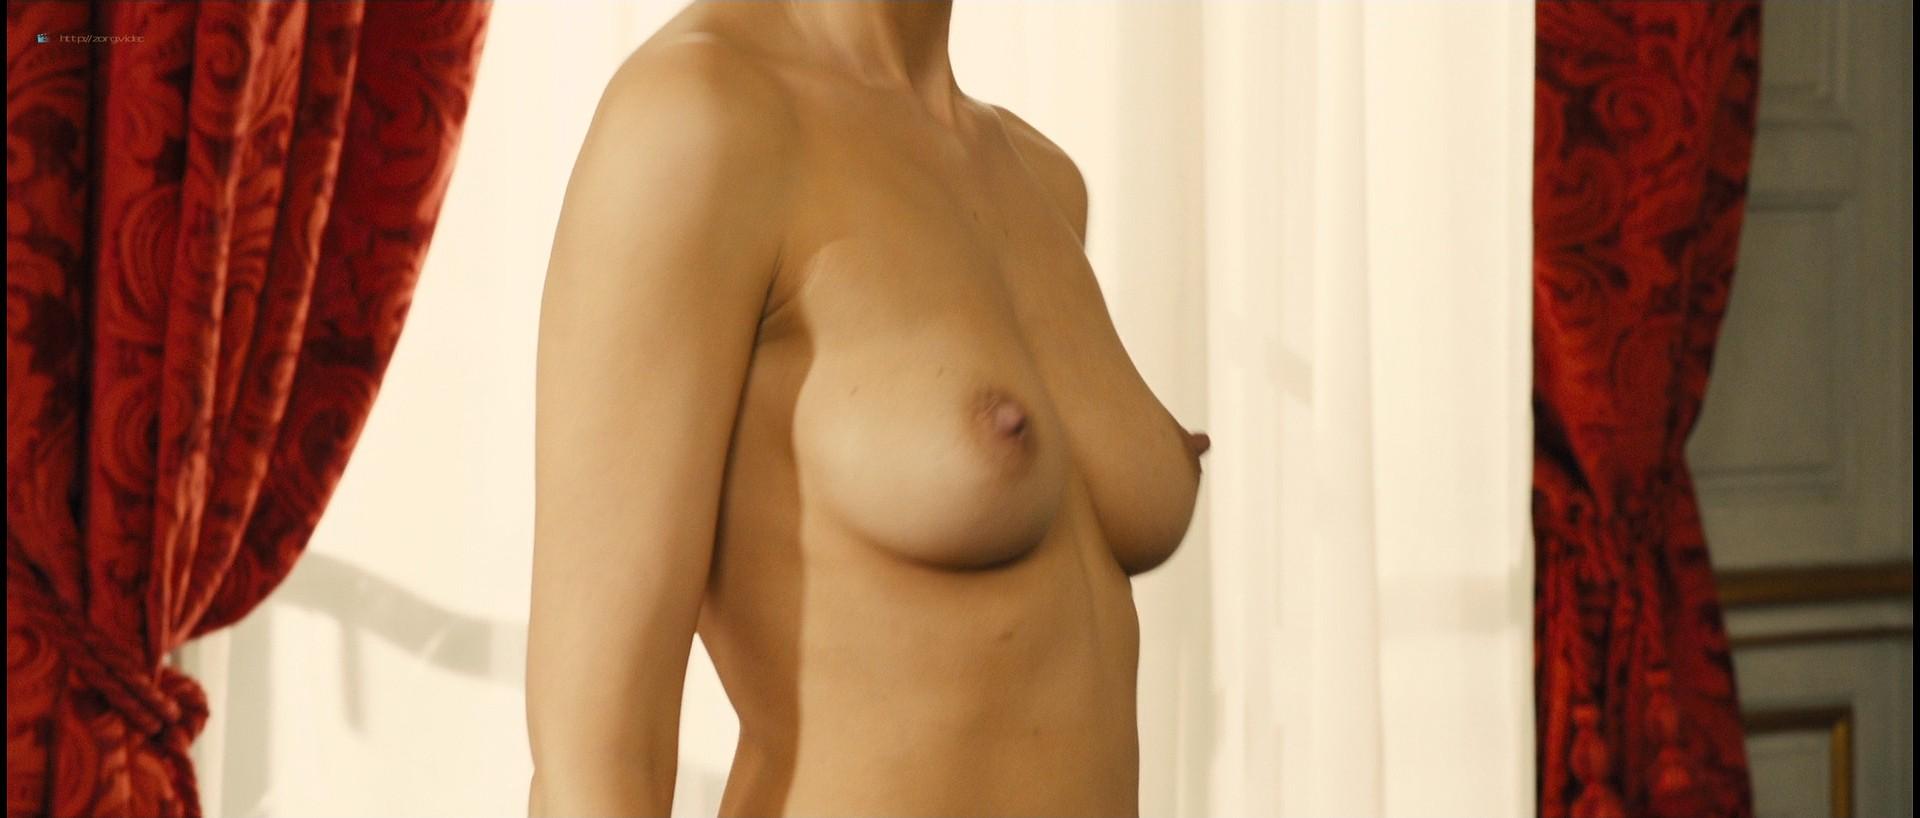 Brigitte Lo Cicero full frontal nude labia - L'exercice de l'État (2011) HD 1080p BluRay (6)